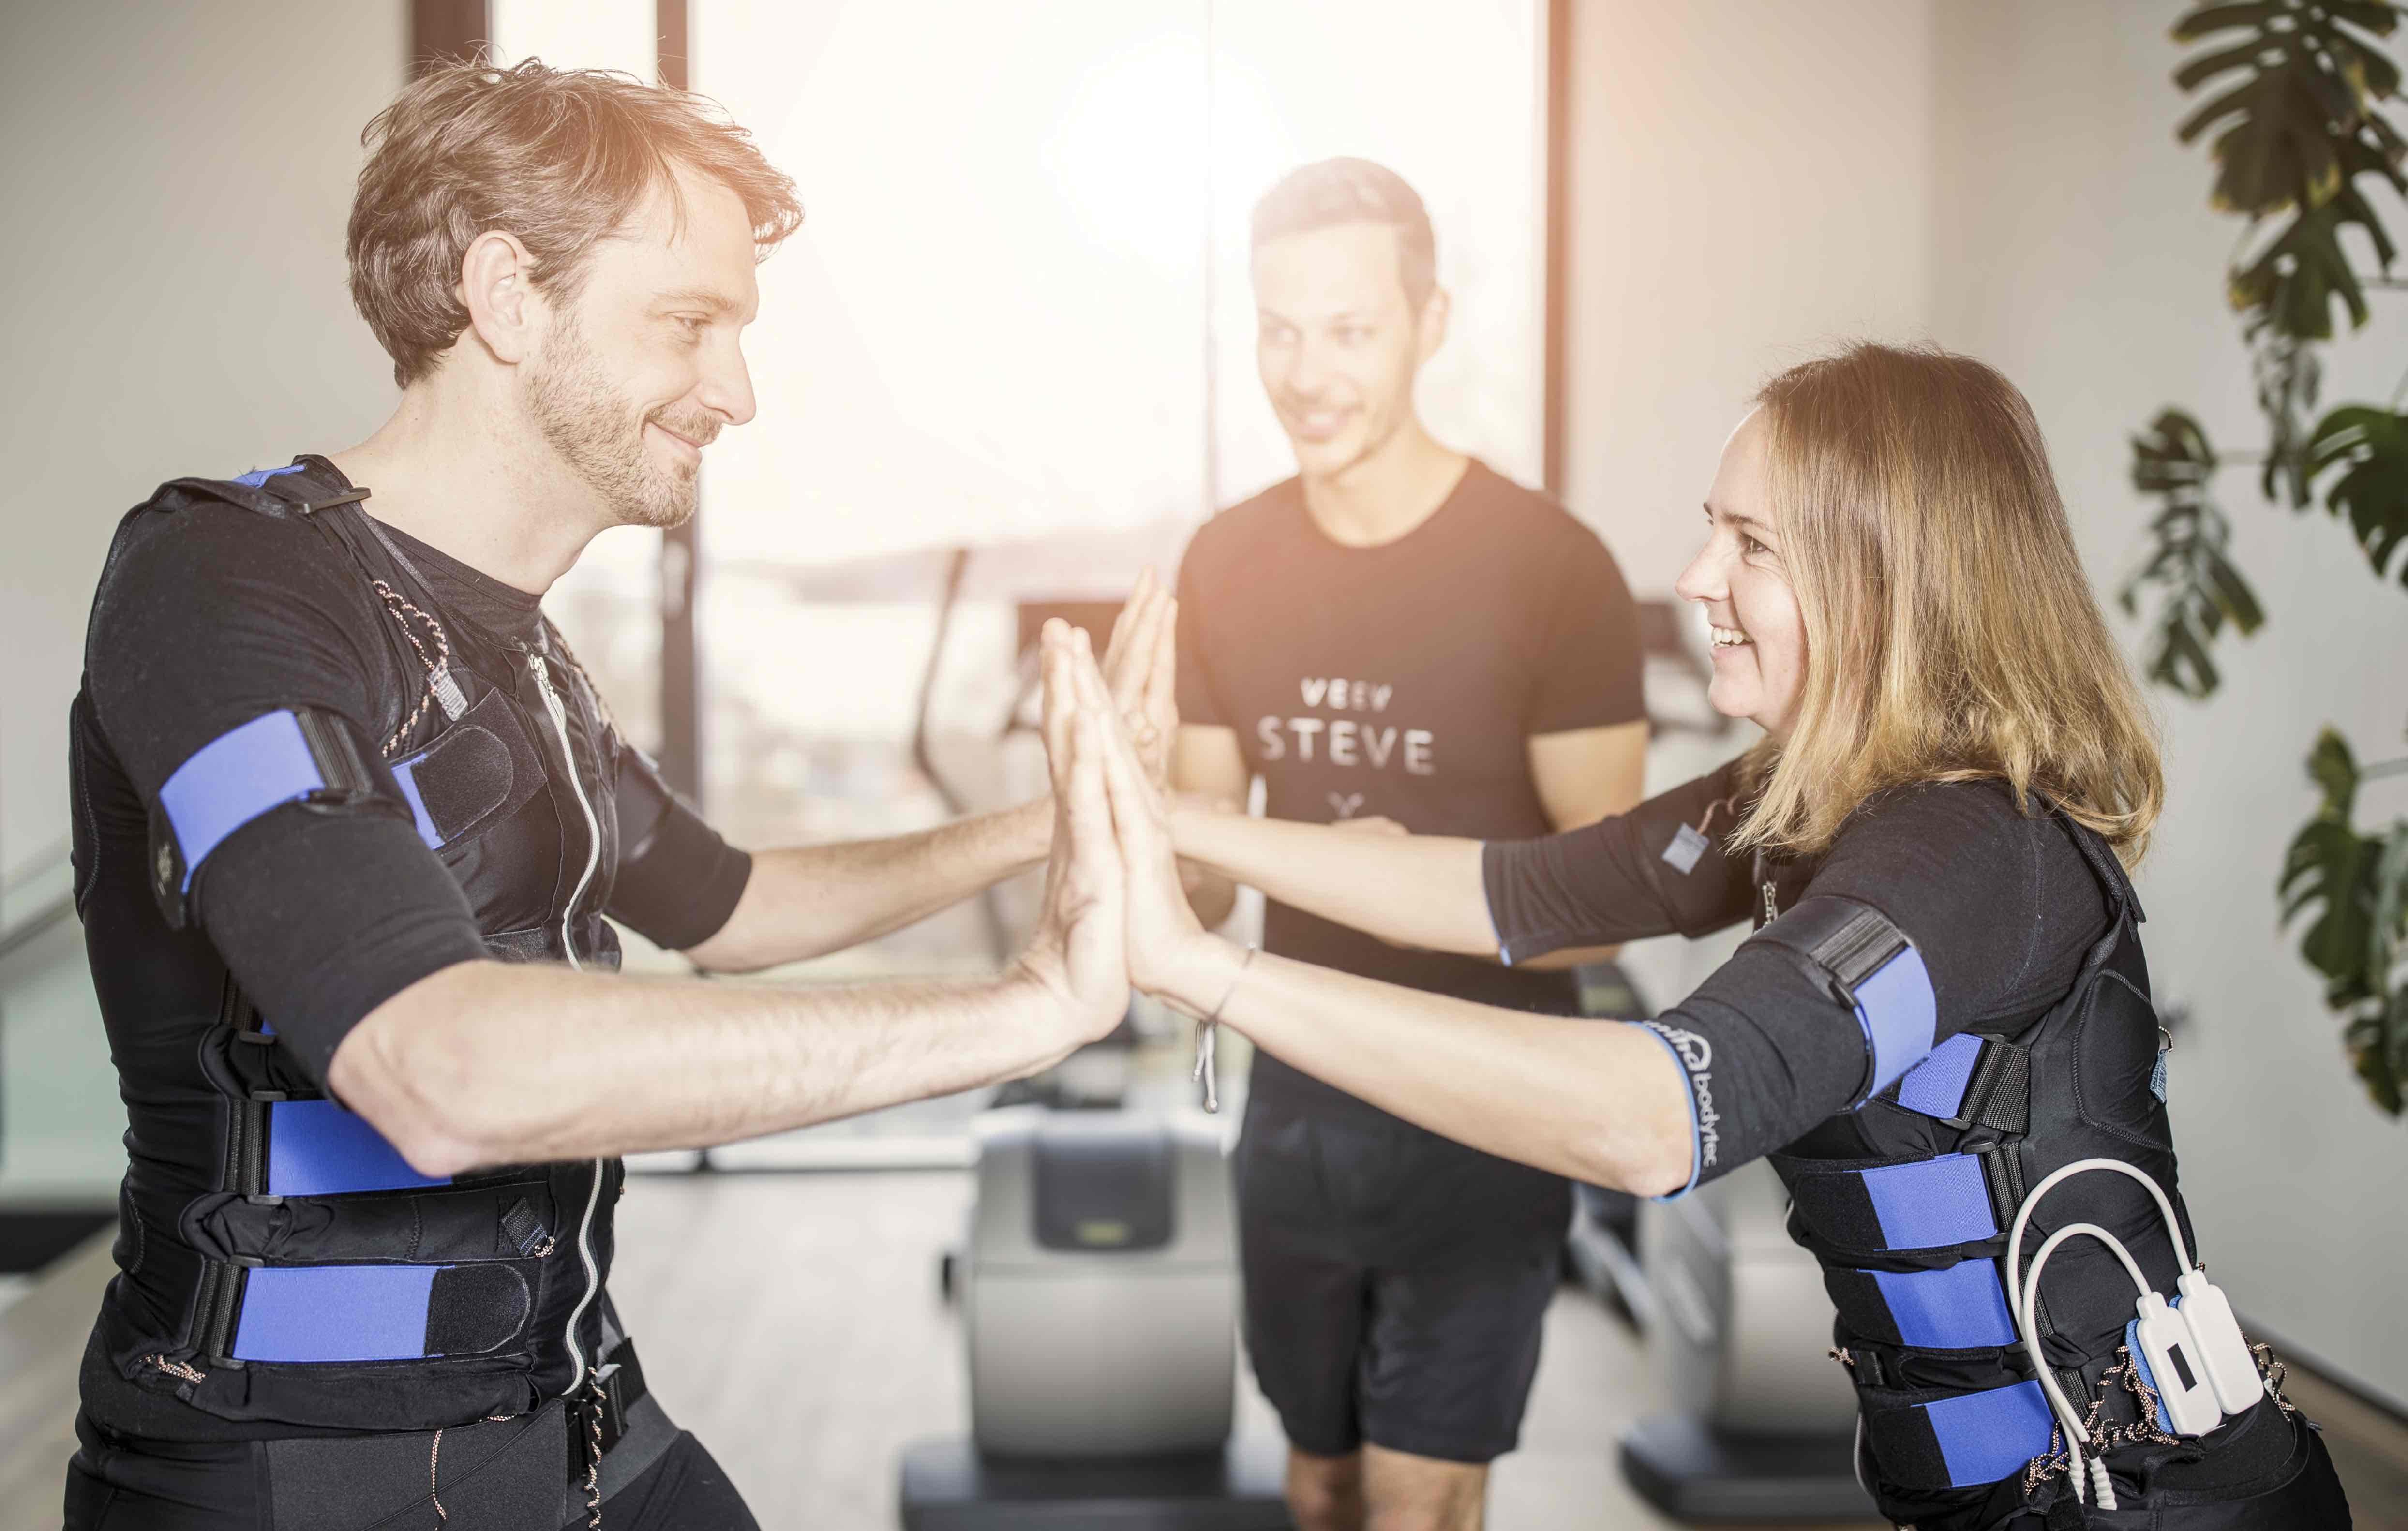 EMS Training stärkt den Rücken und verbrennt Fett